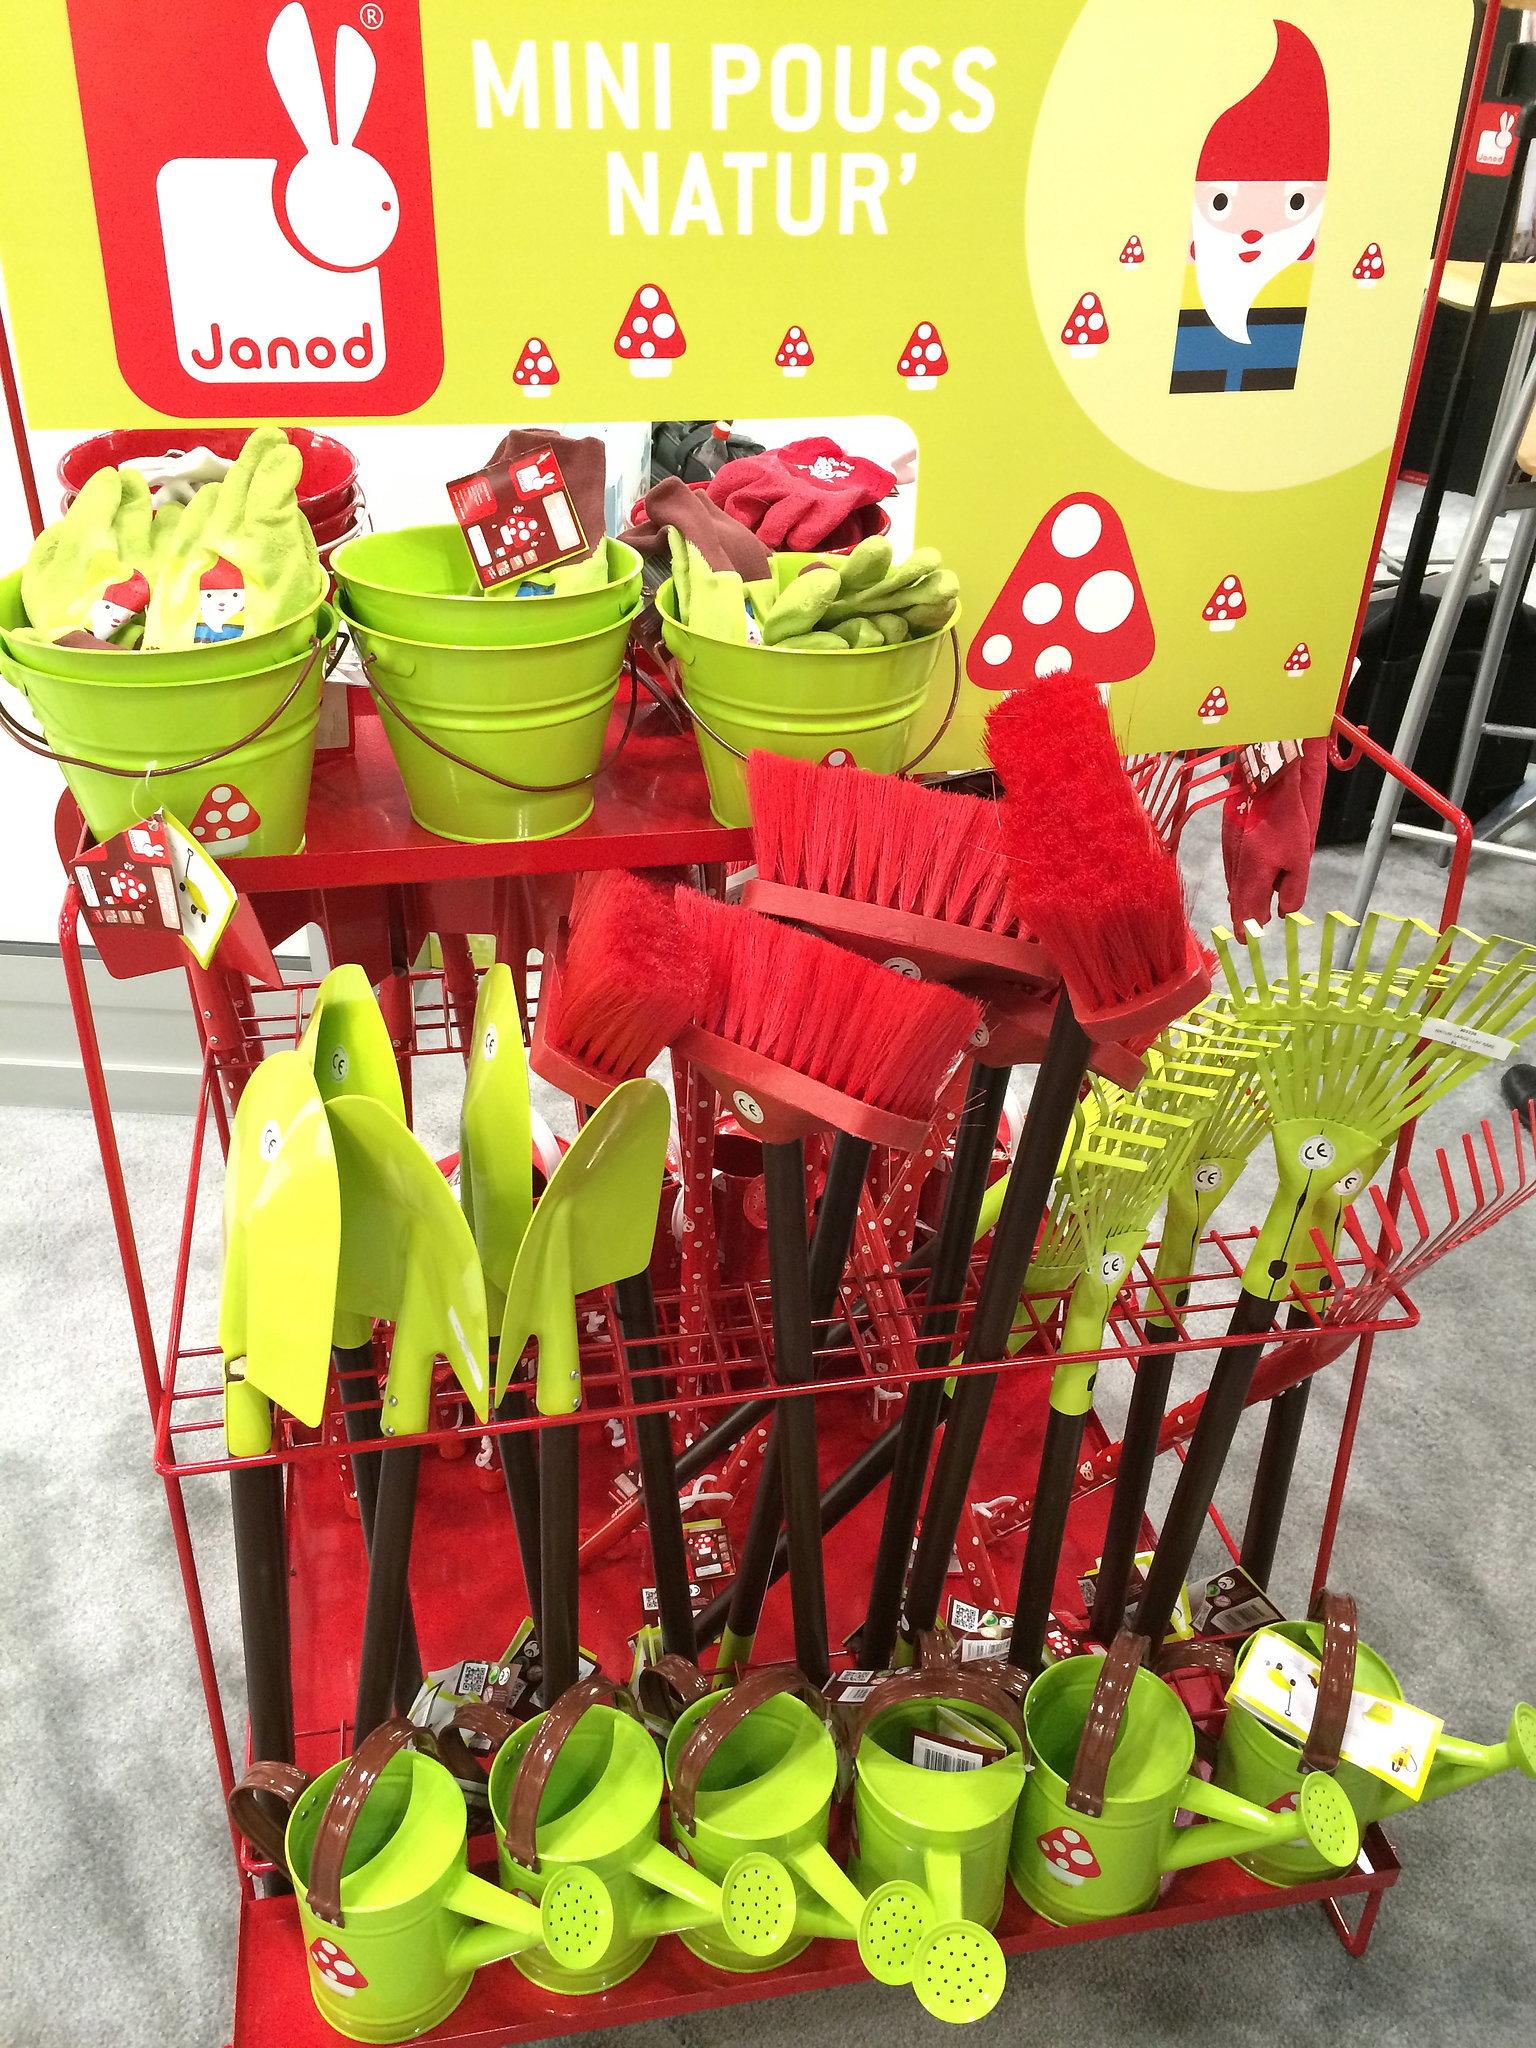 Janod Garden Tools